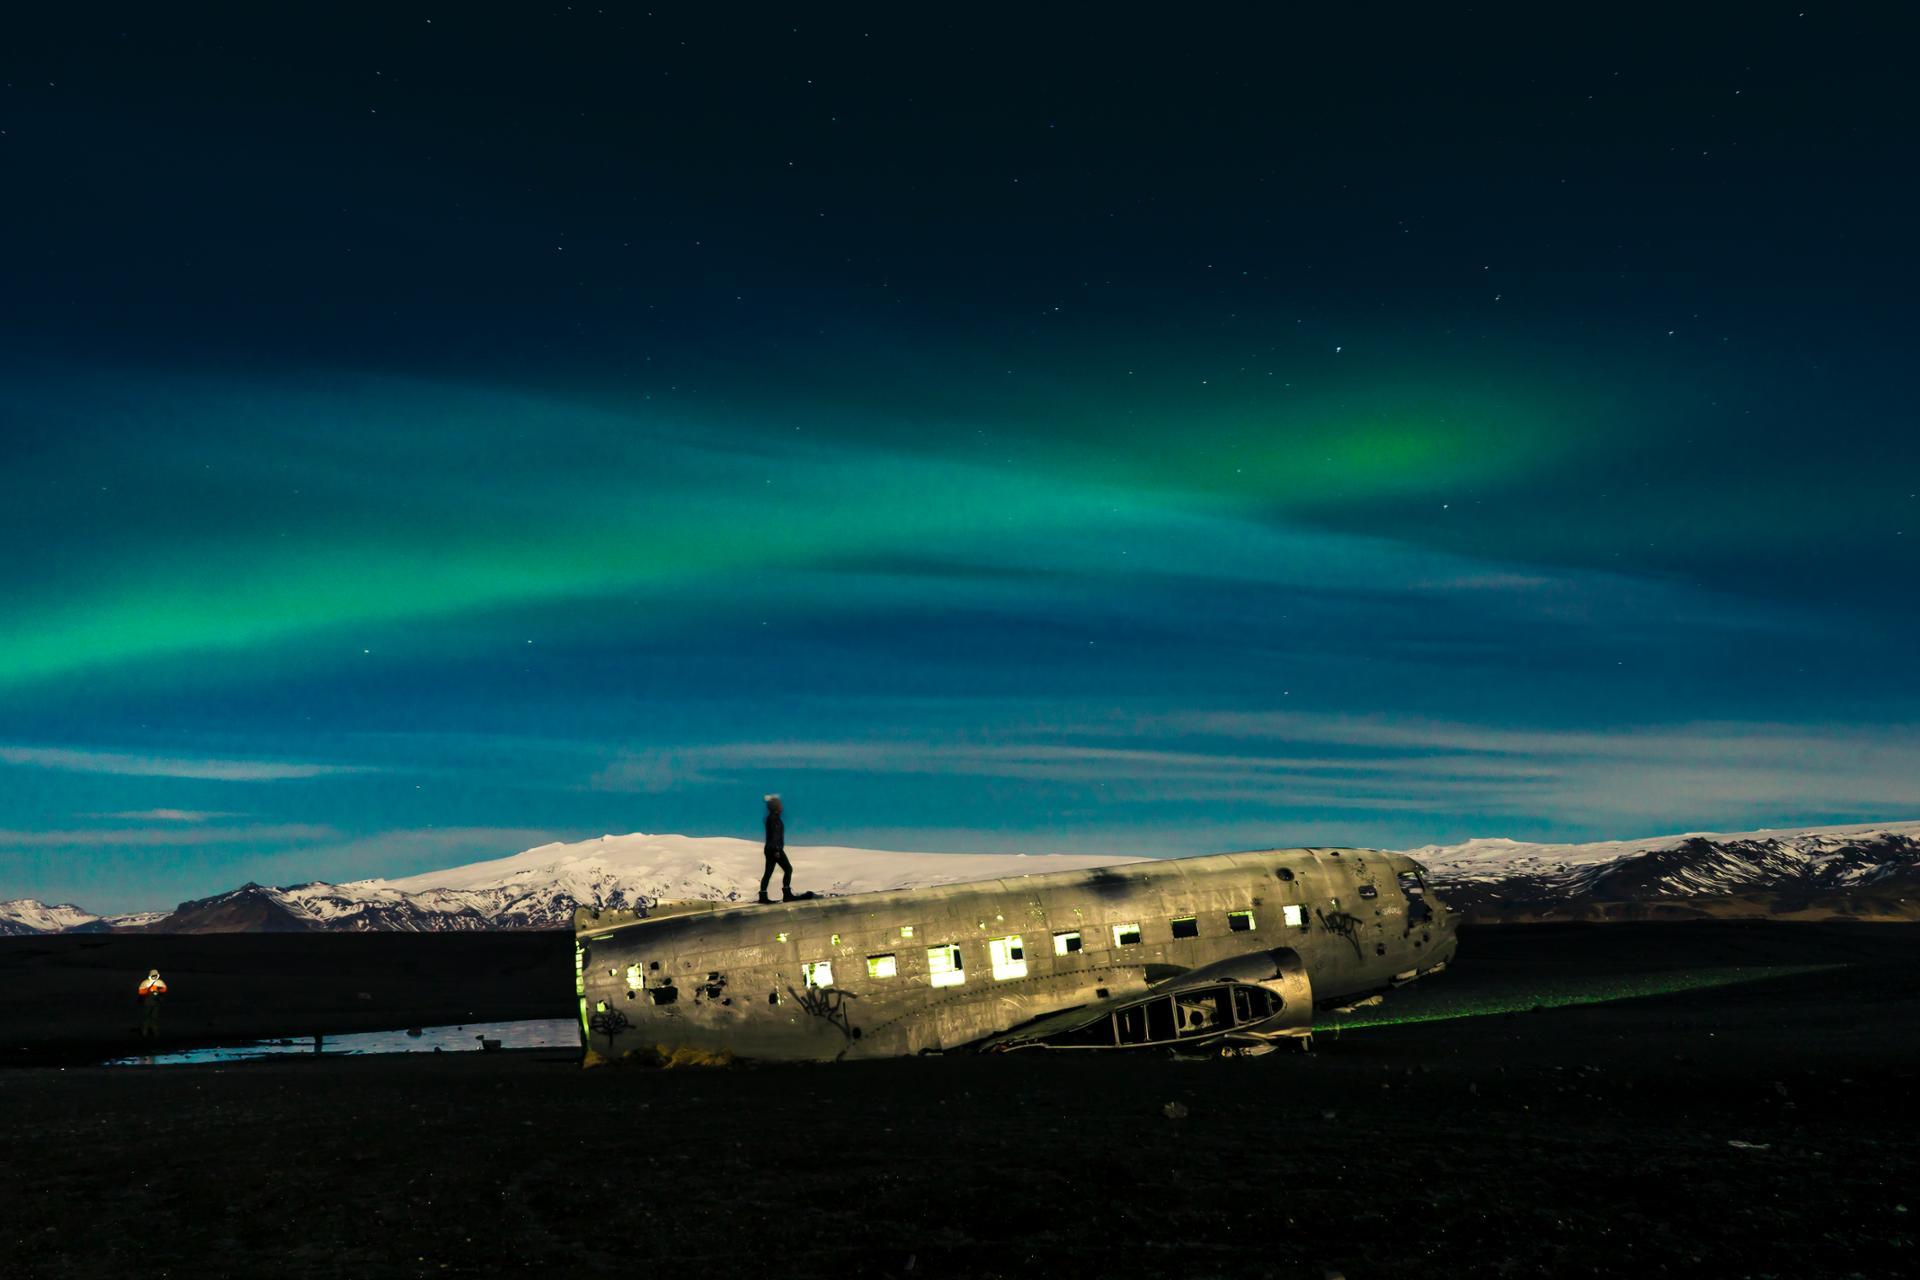 DC-3 Plane, Iceland